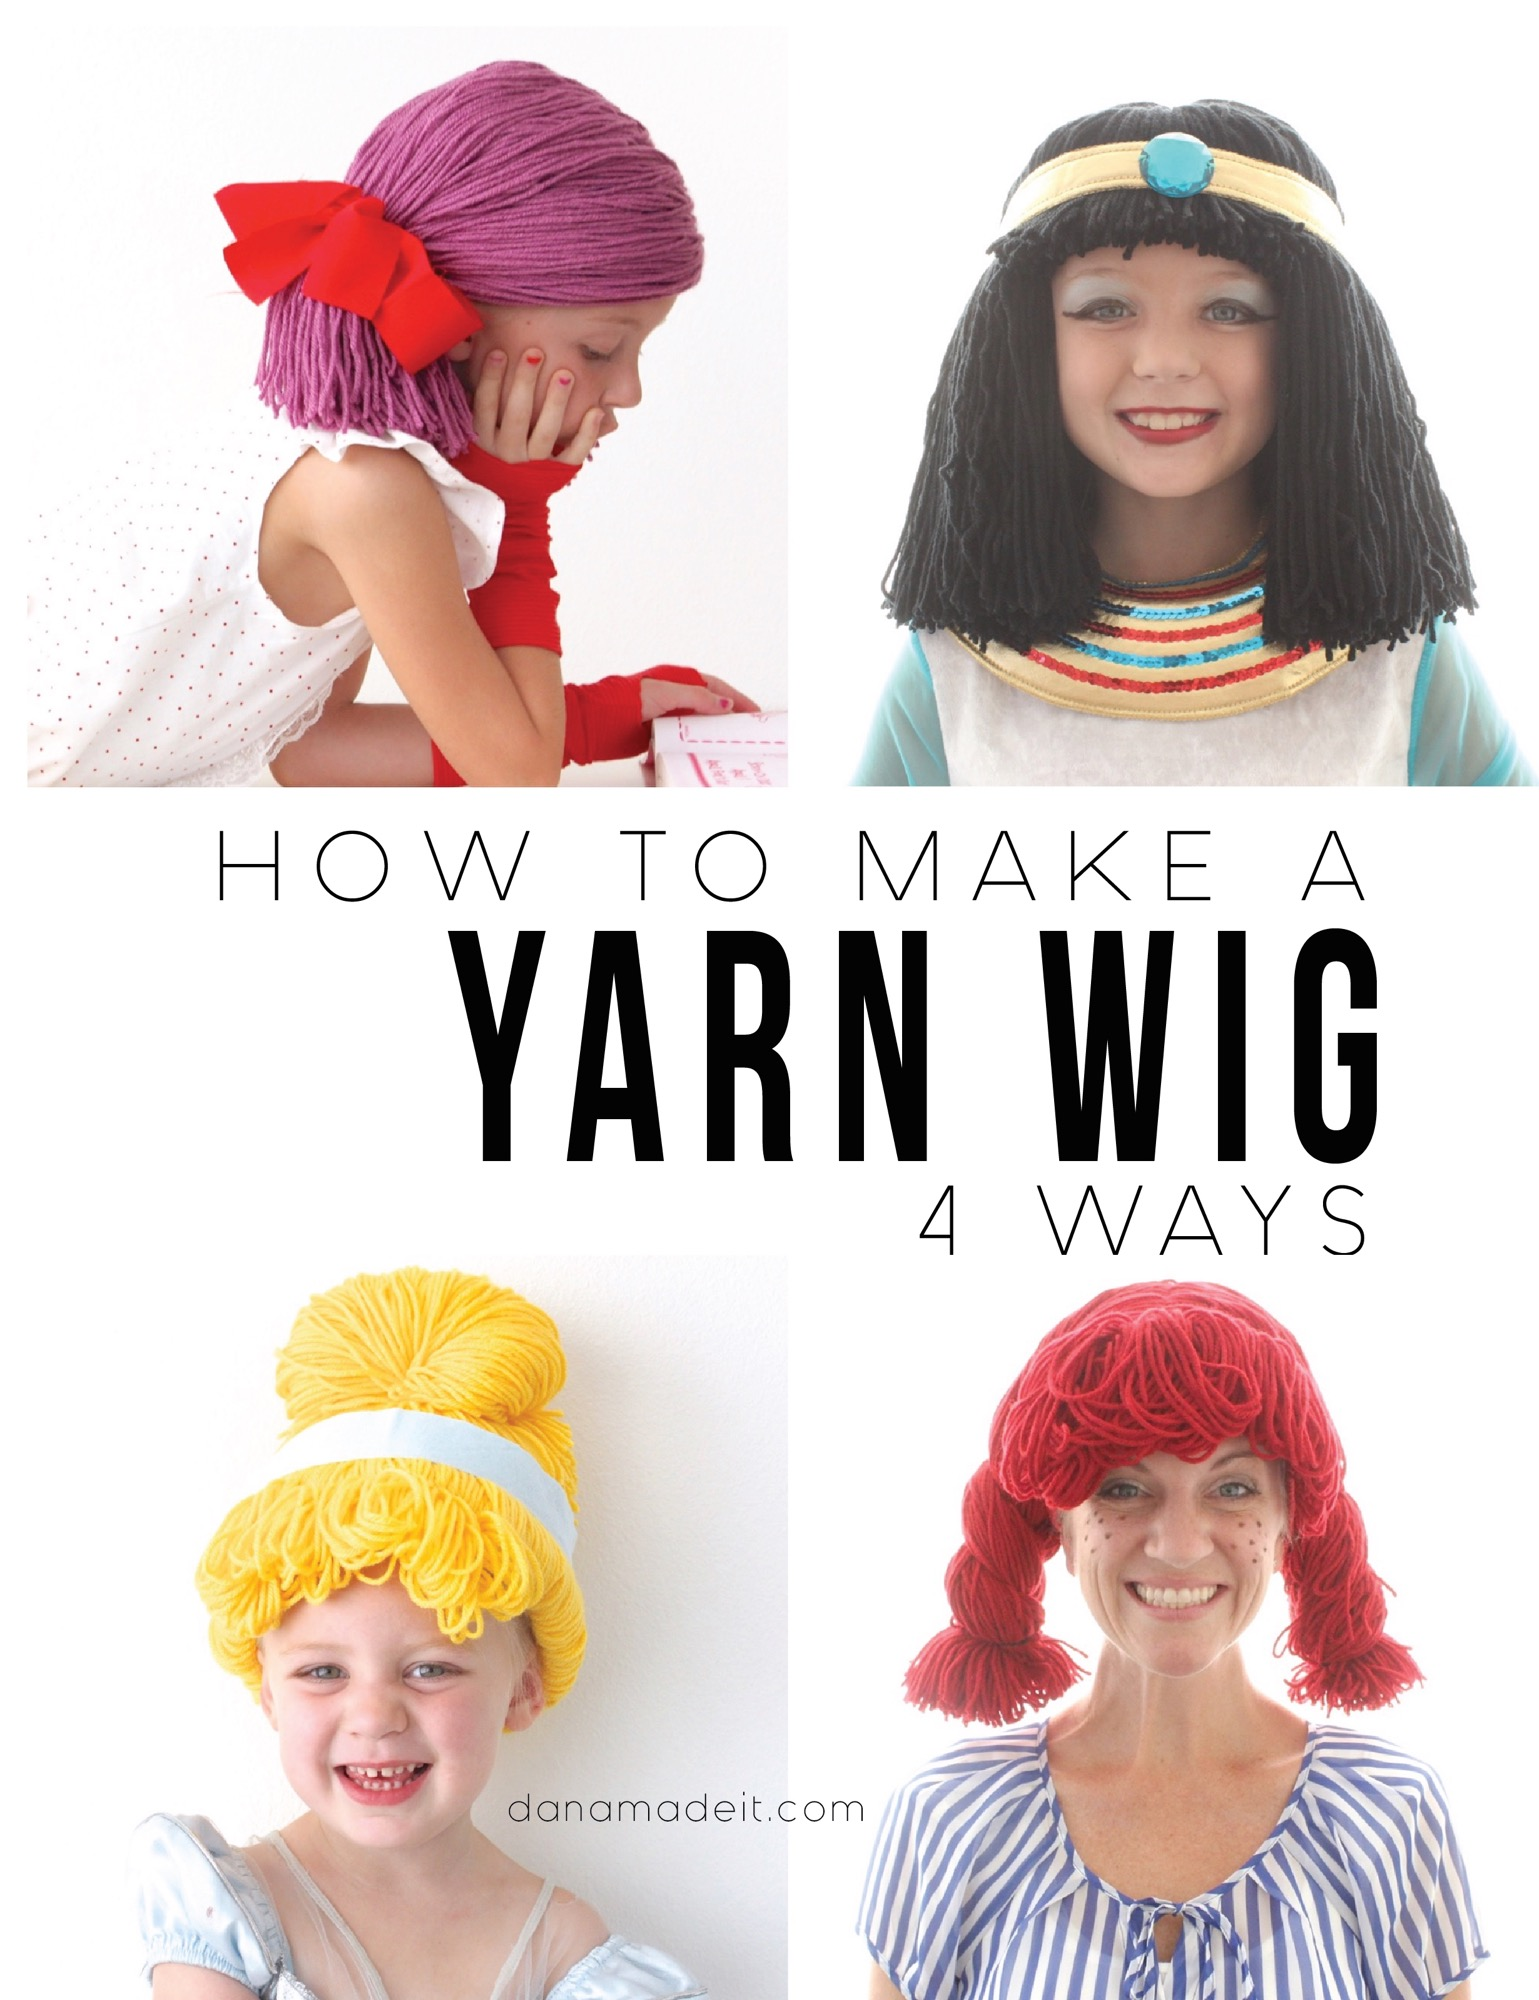 Yarn Wigs Made Everyday